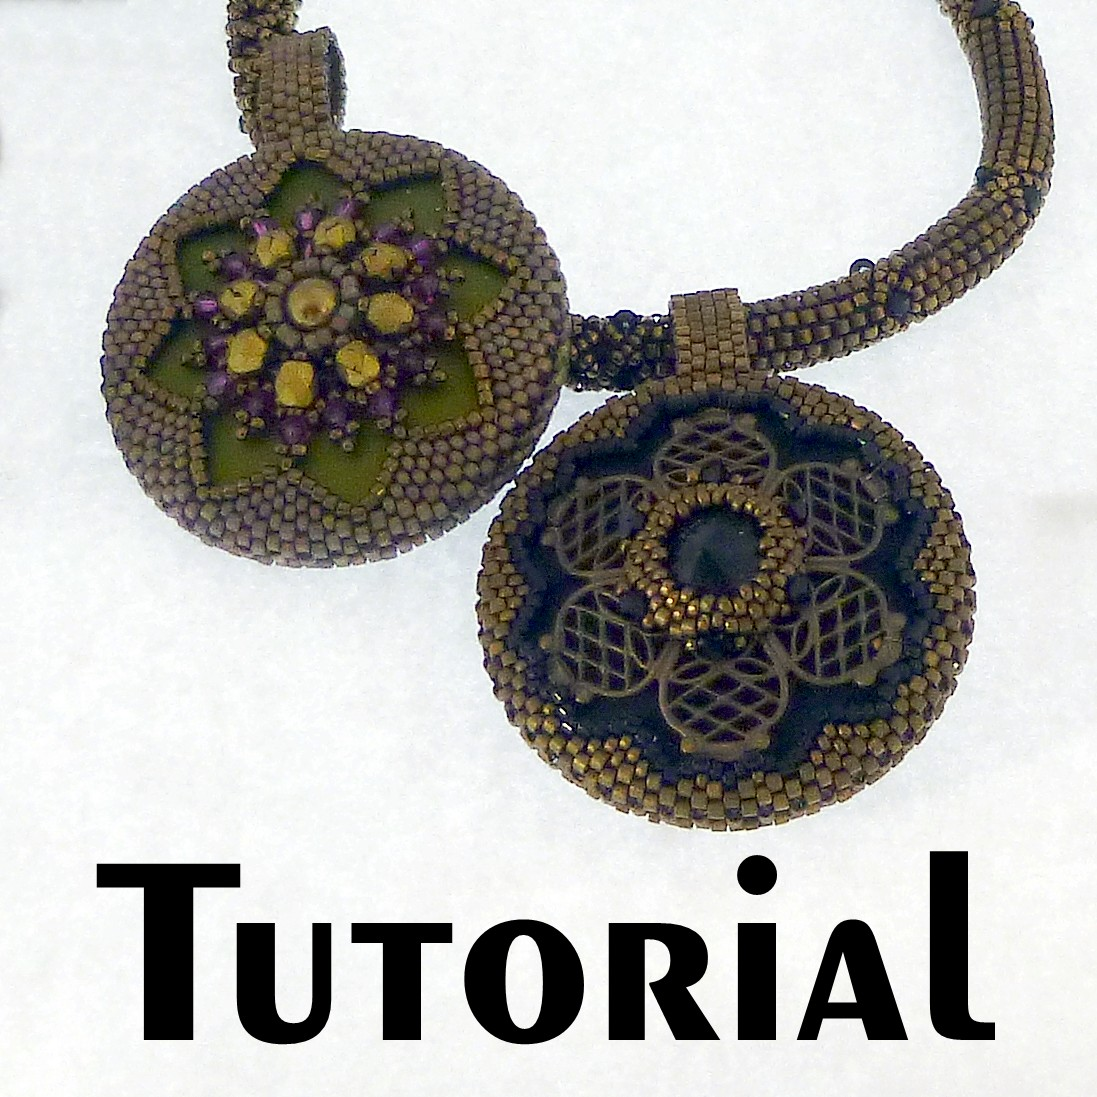 Tutorial gothic medallion reversible pendant with rope mikki tutorial gothic medallion reversible pendant with rope mikki ferrugiaro designs mozeypictures Choice Image